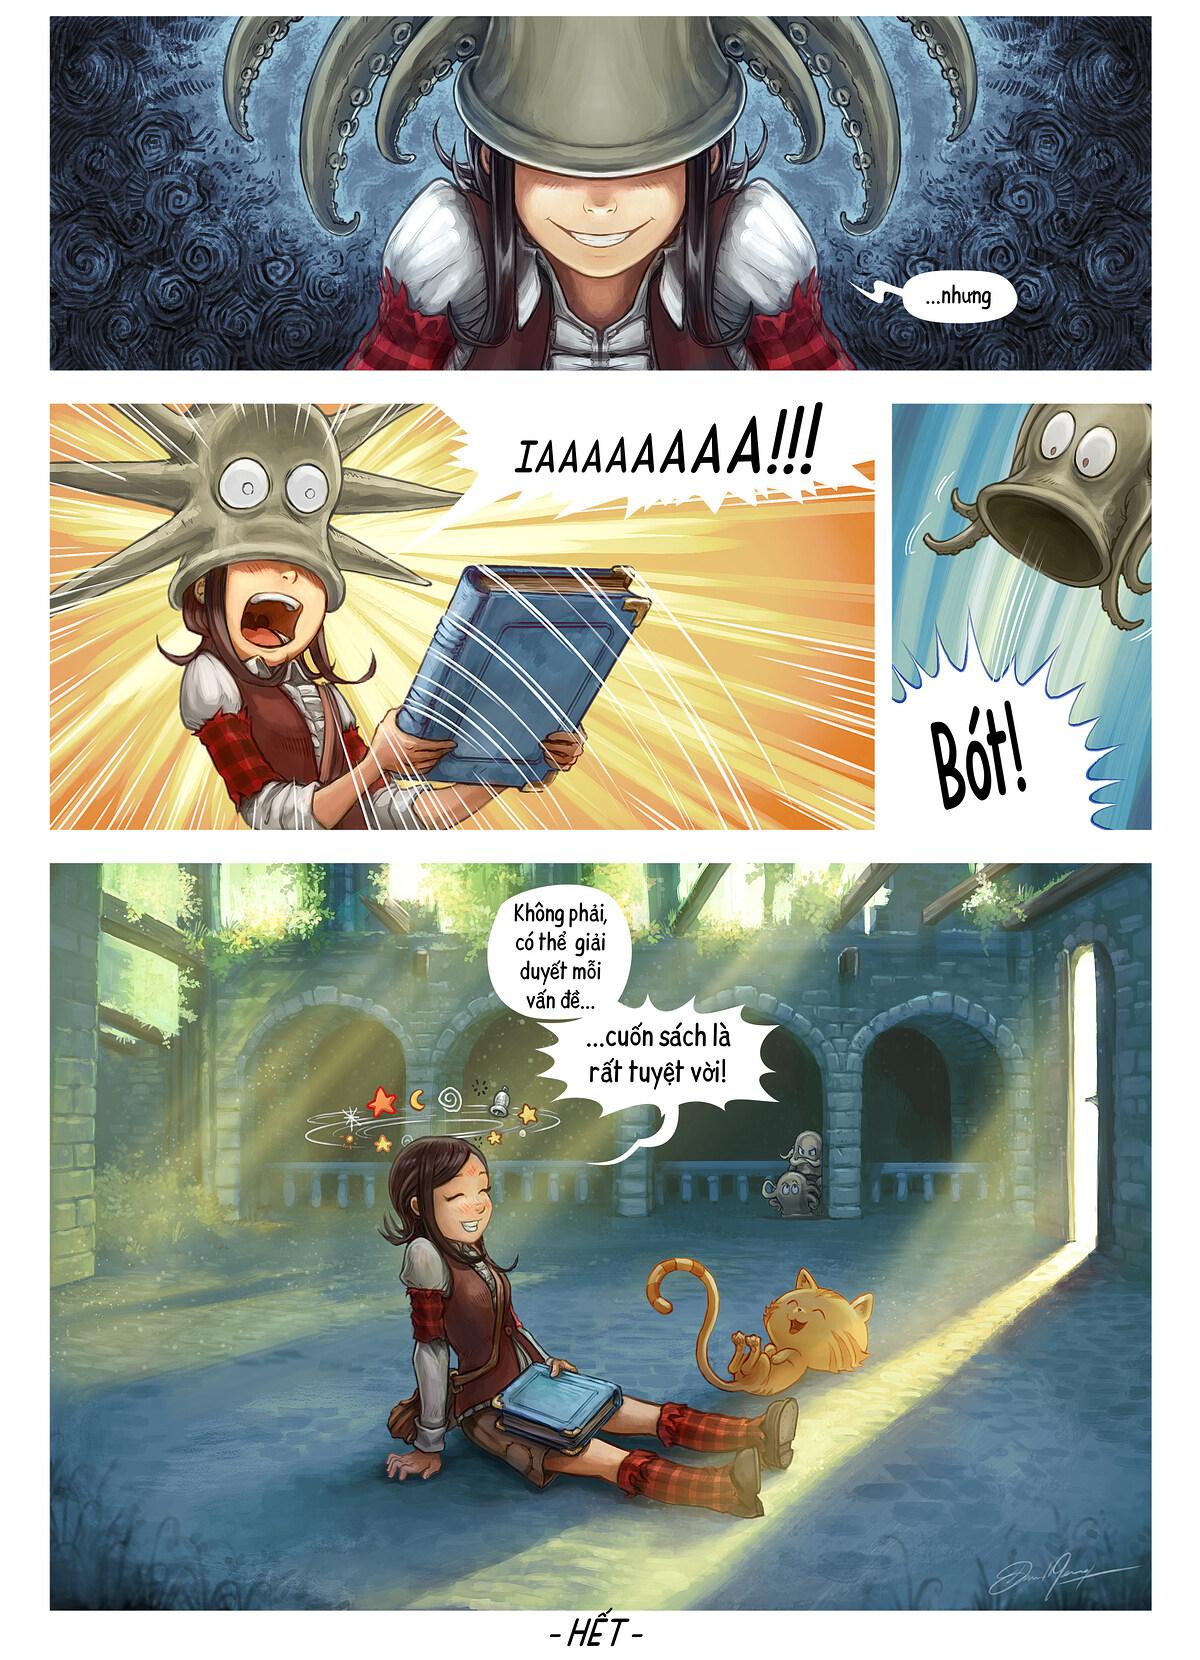 A webcomic page of Pepper&Carrot, Tập 26 [vi], trang 6